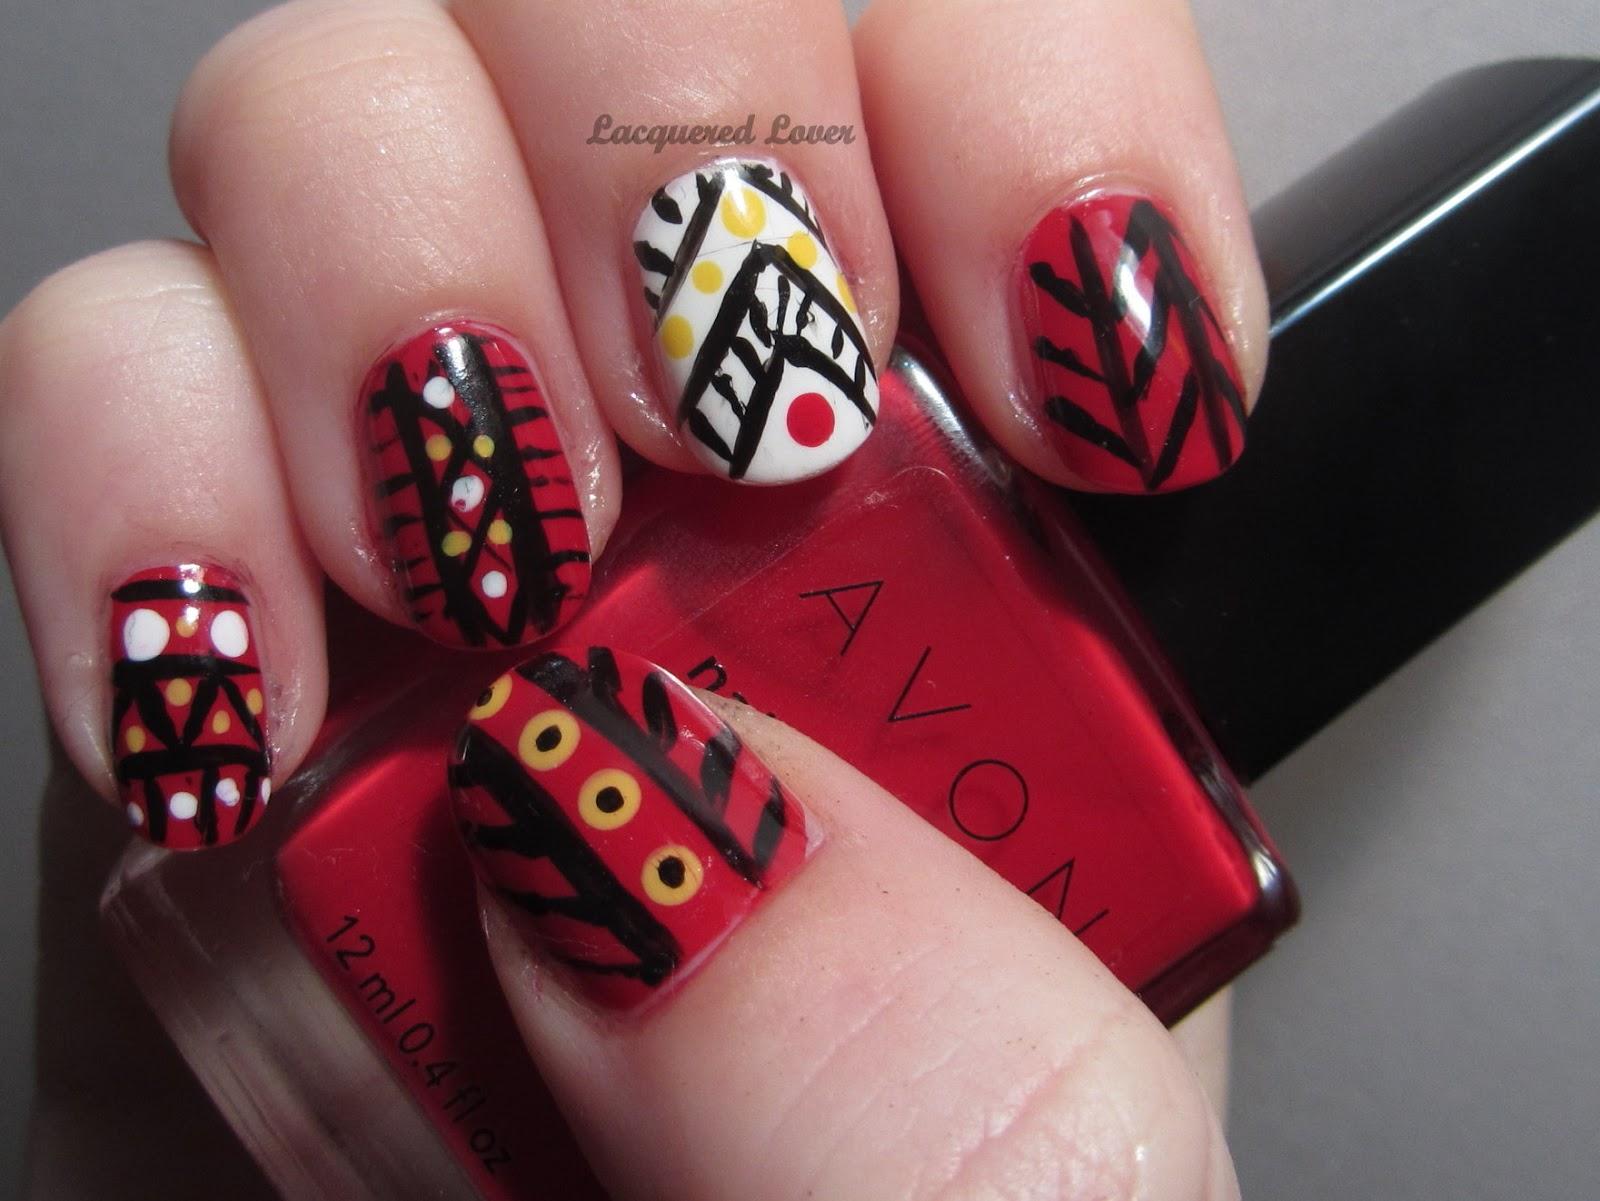 Lacquered Lover: Avon Nail Polish Tribal Nail Art!